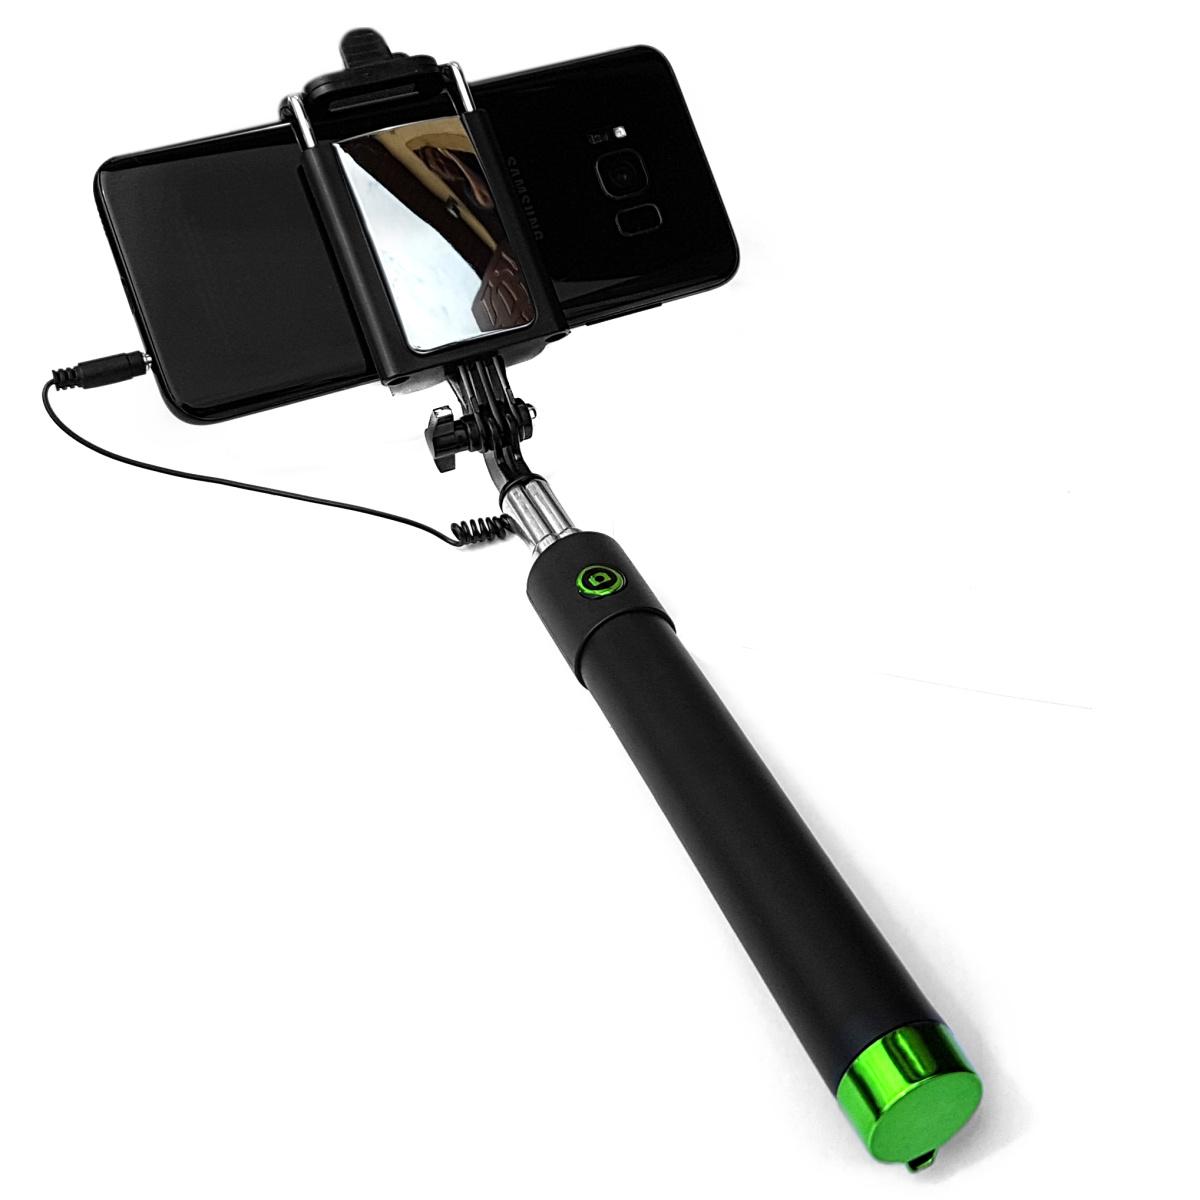 Kijek Selfiestick Monopod Huawei Nova 2